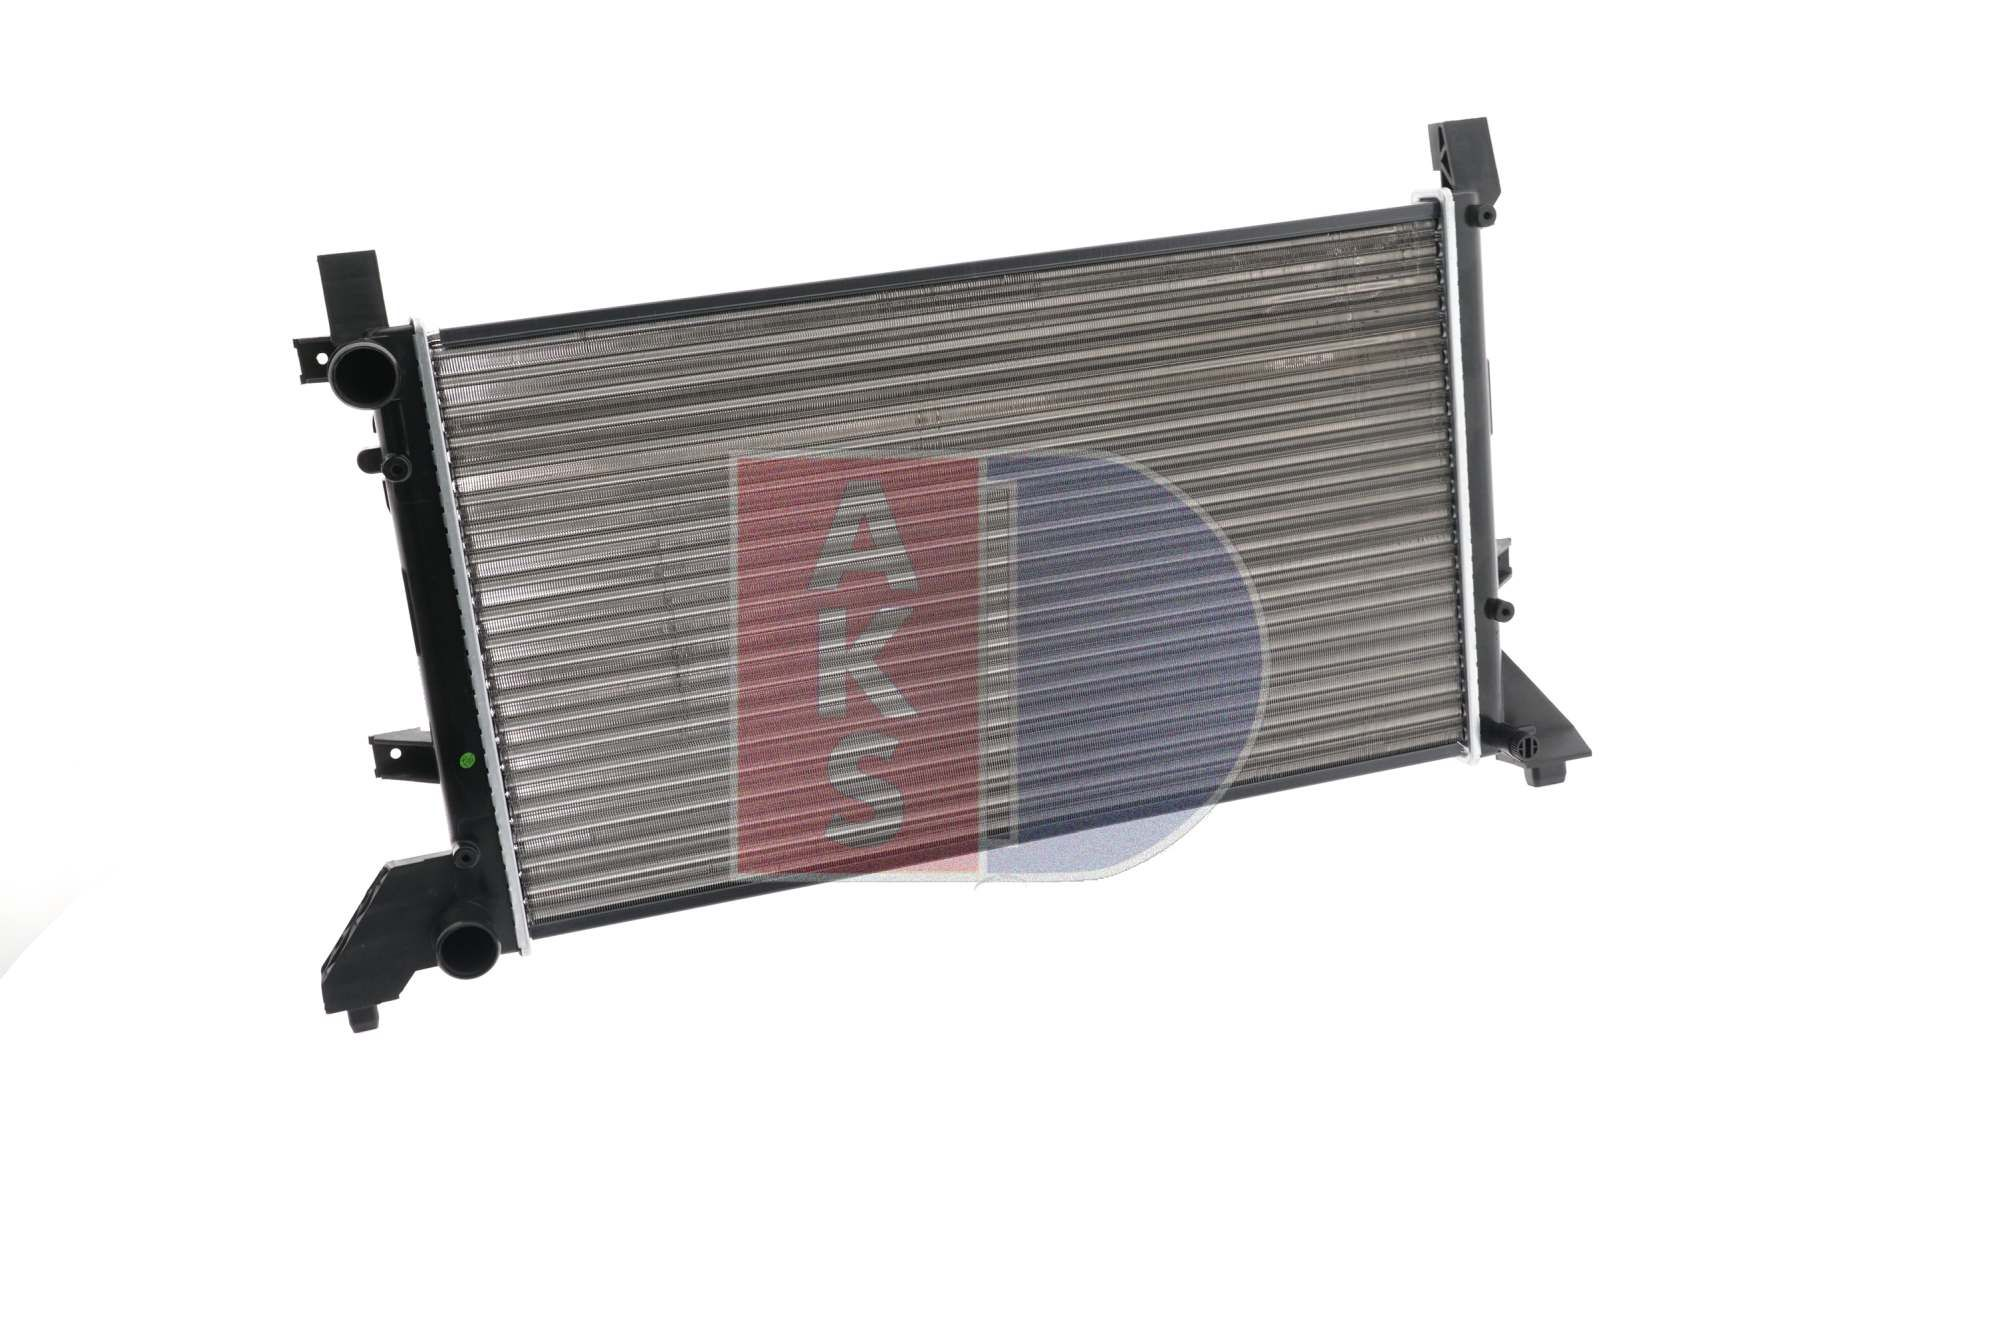 240070N Wasserkühler AKS DASIS 240070N - Große Auswahl - stark reduziert